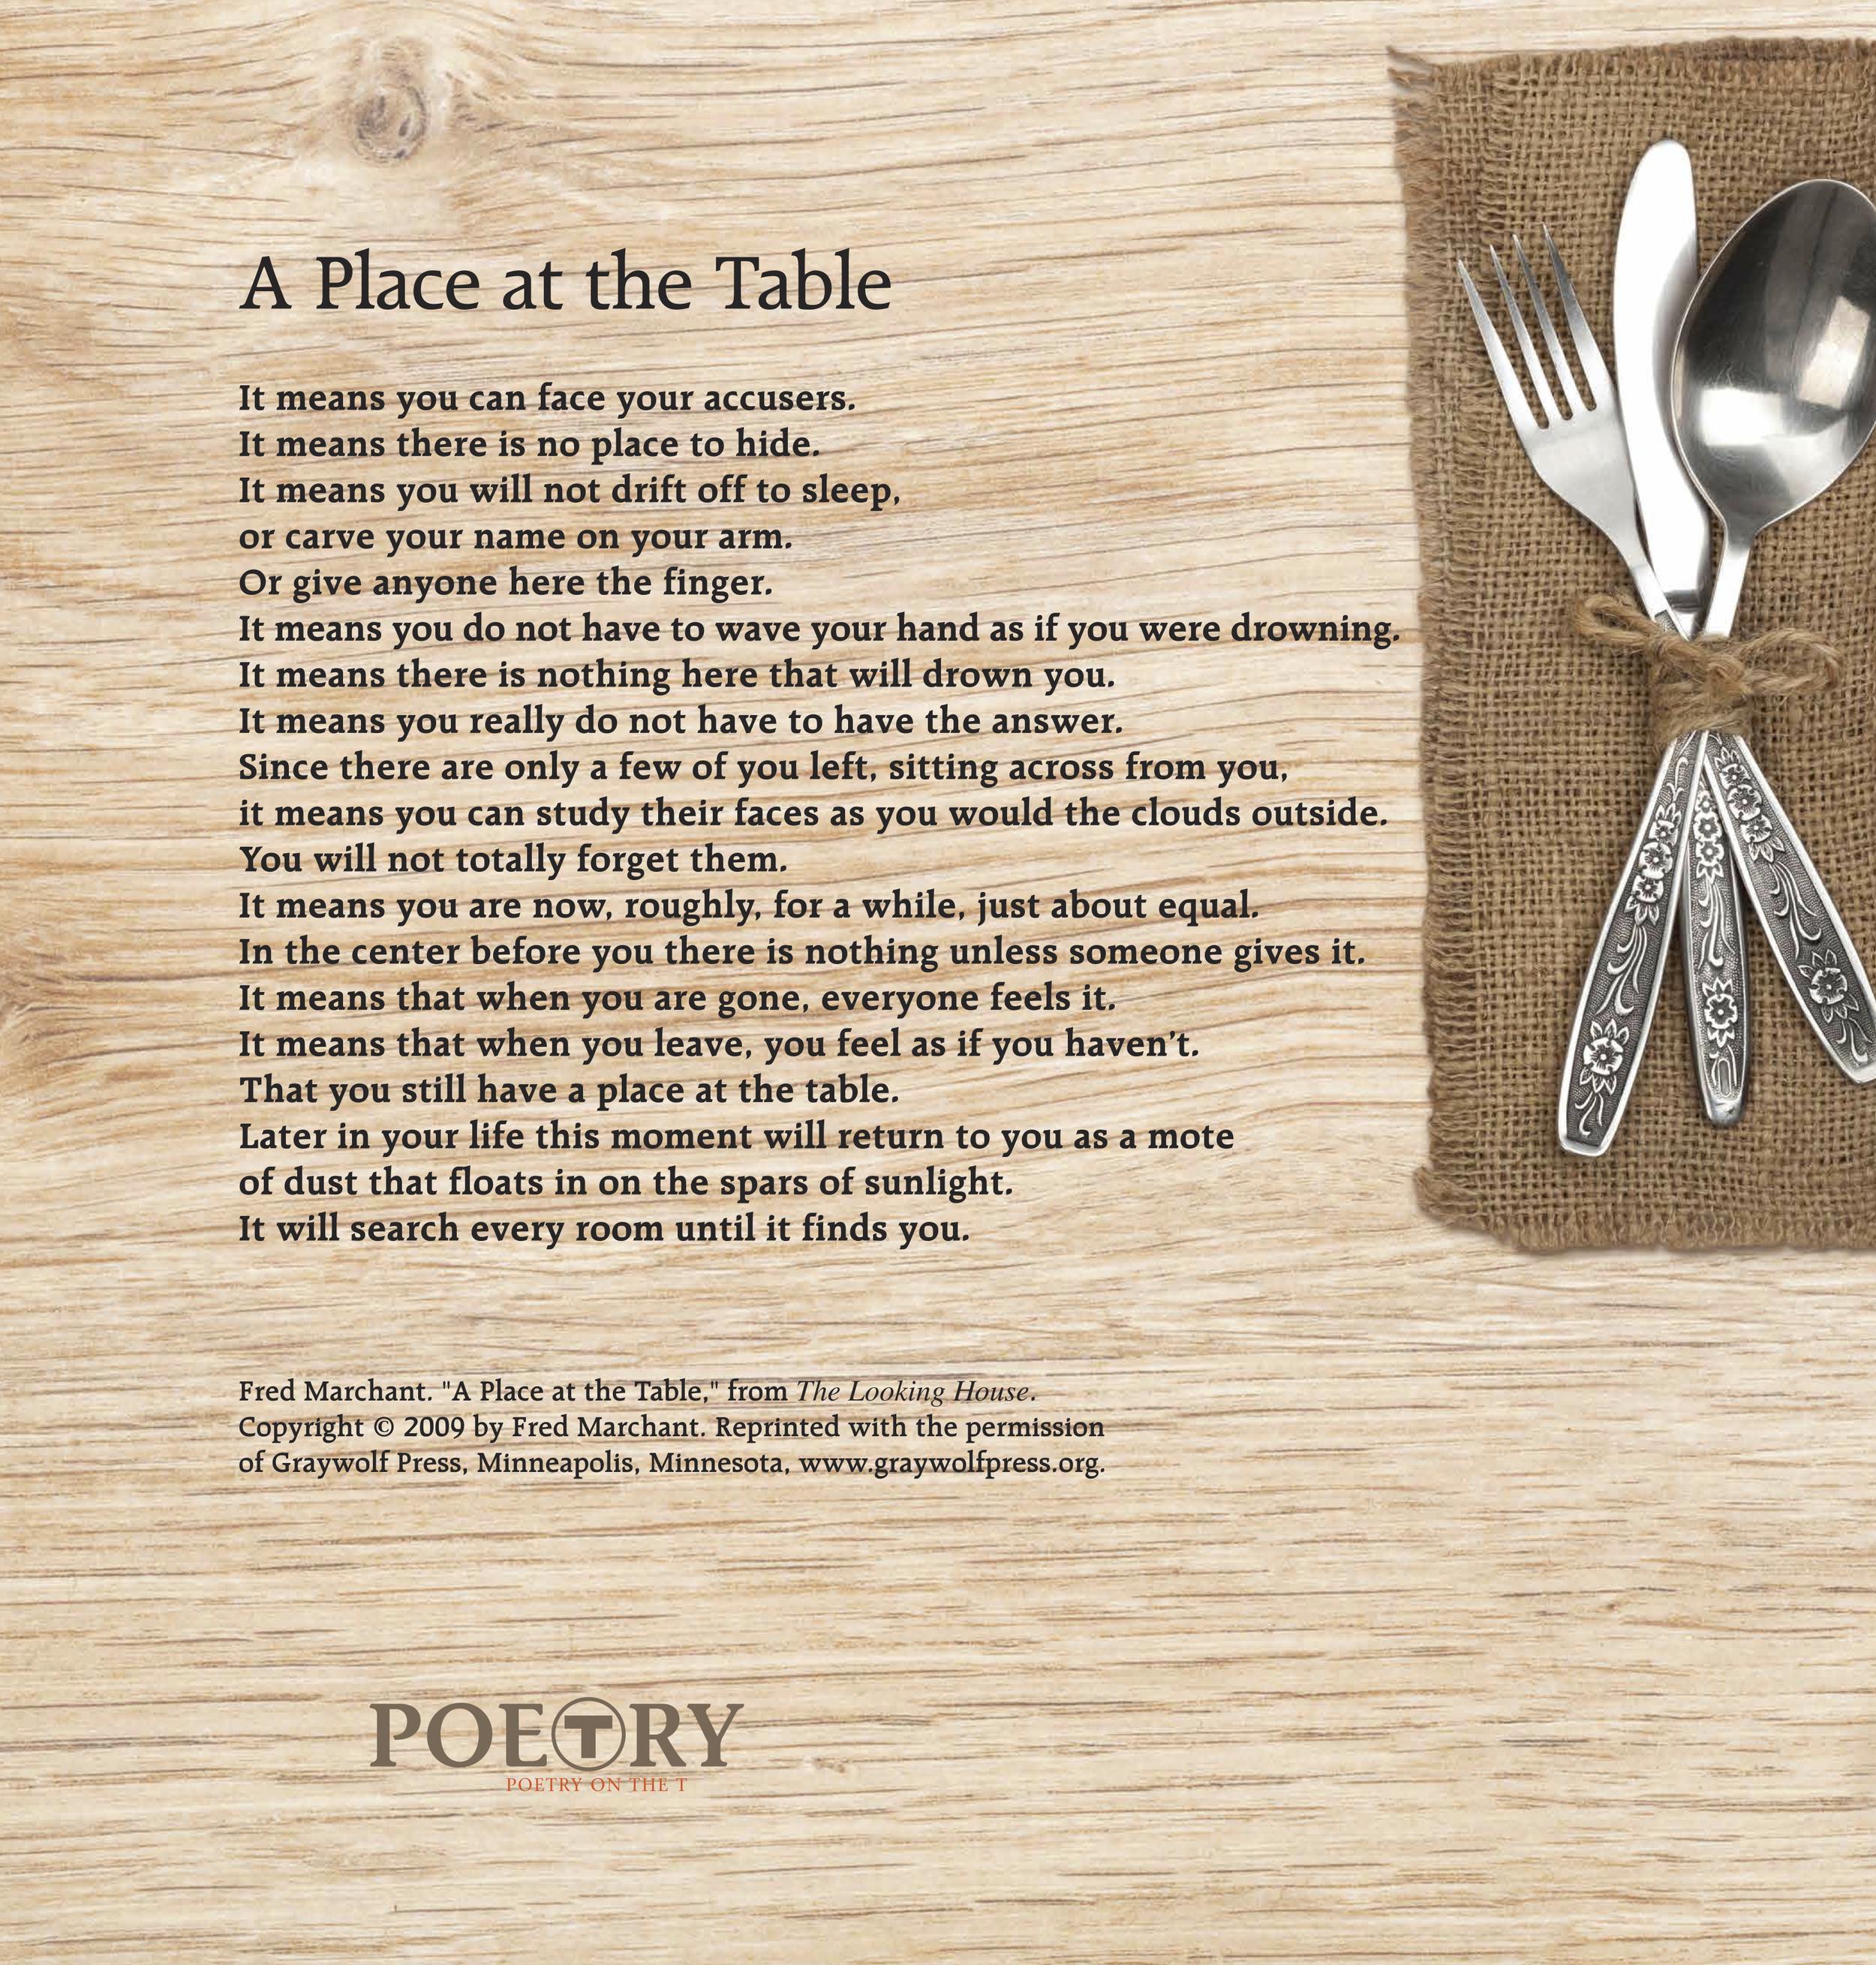 MassPoetry-T-PoemsAUG14-TABLE-notear.jpg